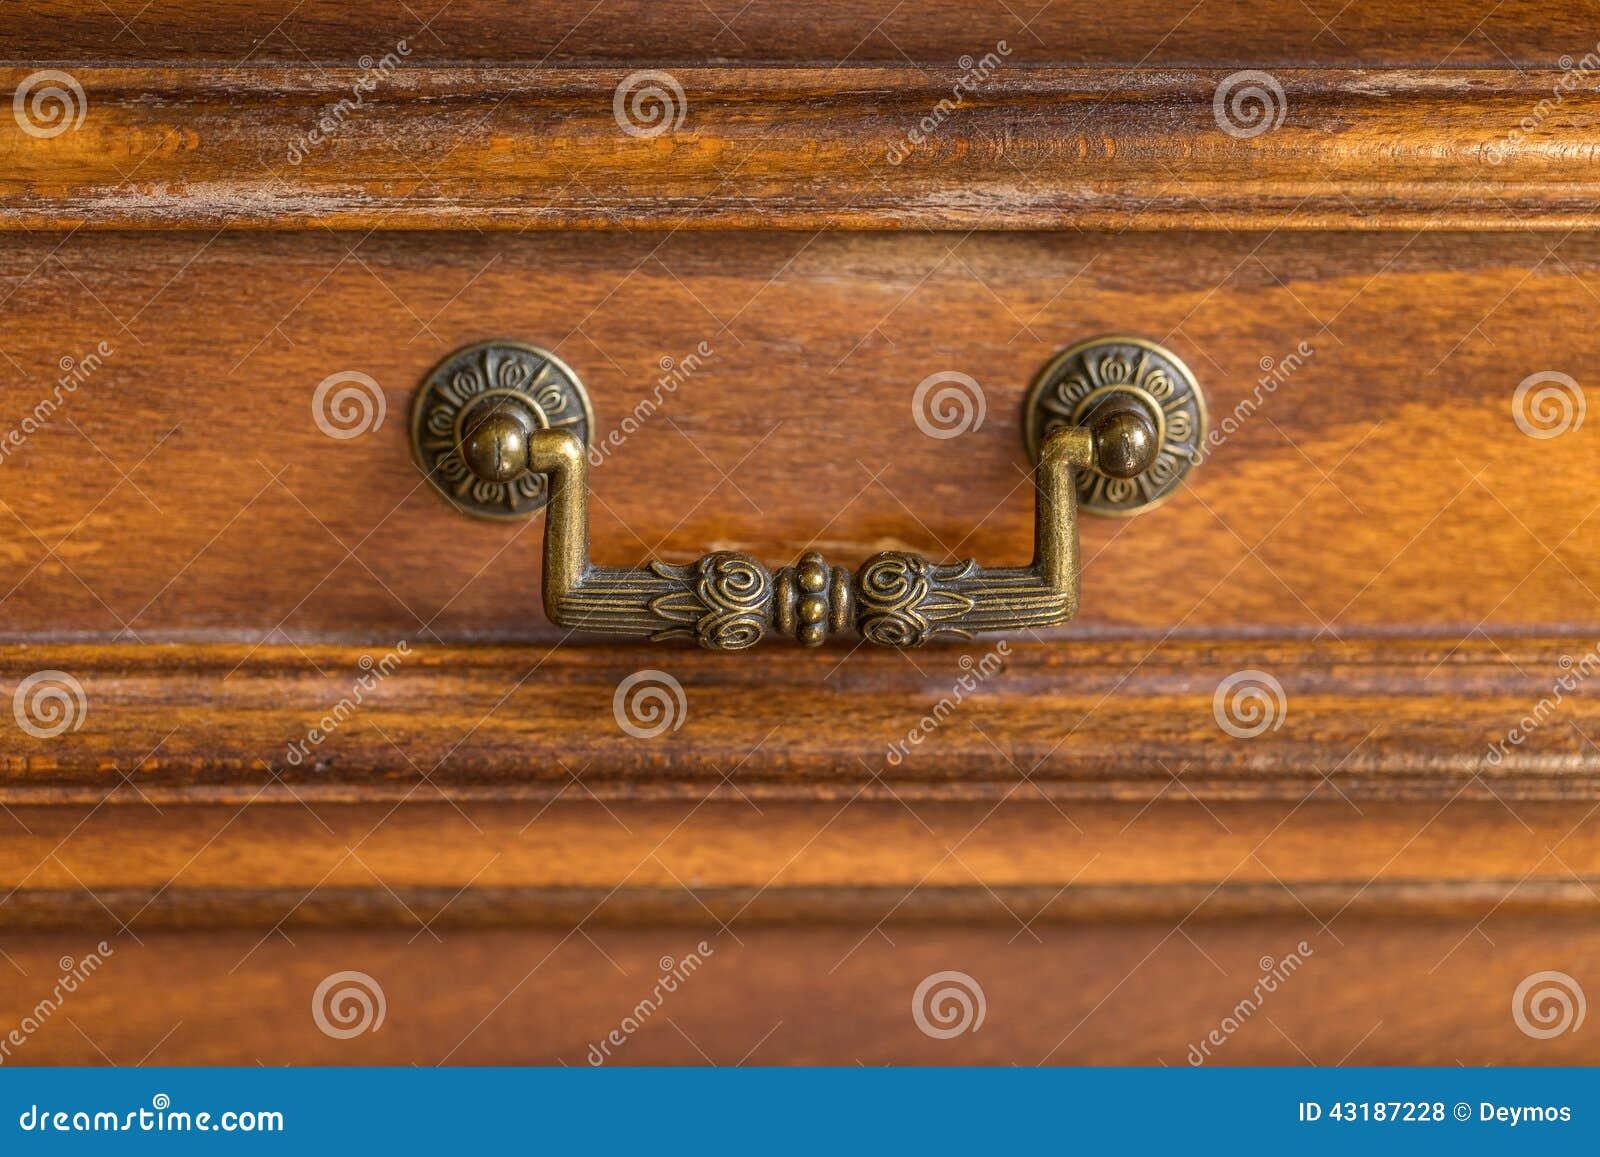 Decorative Metal Ornate Drawer Handle Stock Photo - Image of ...